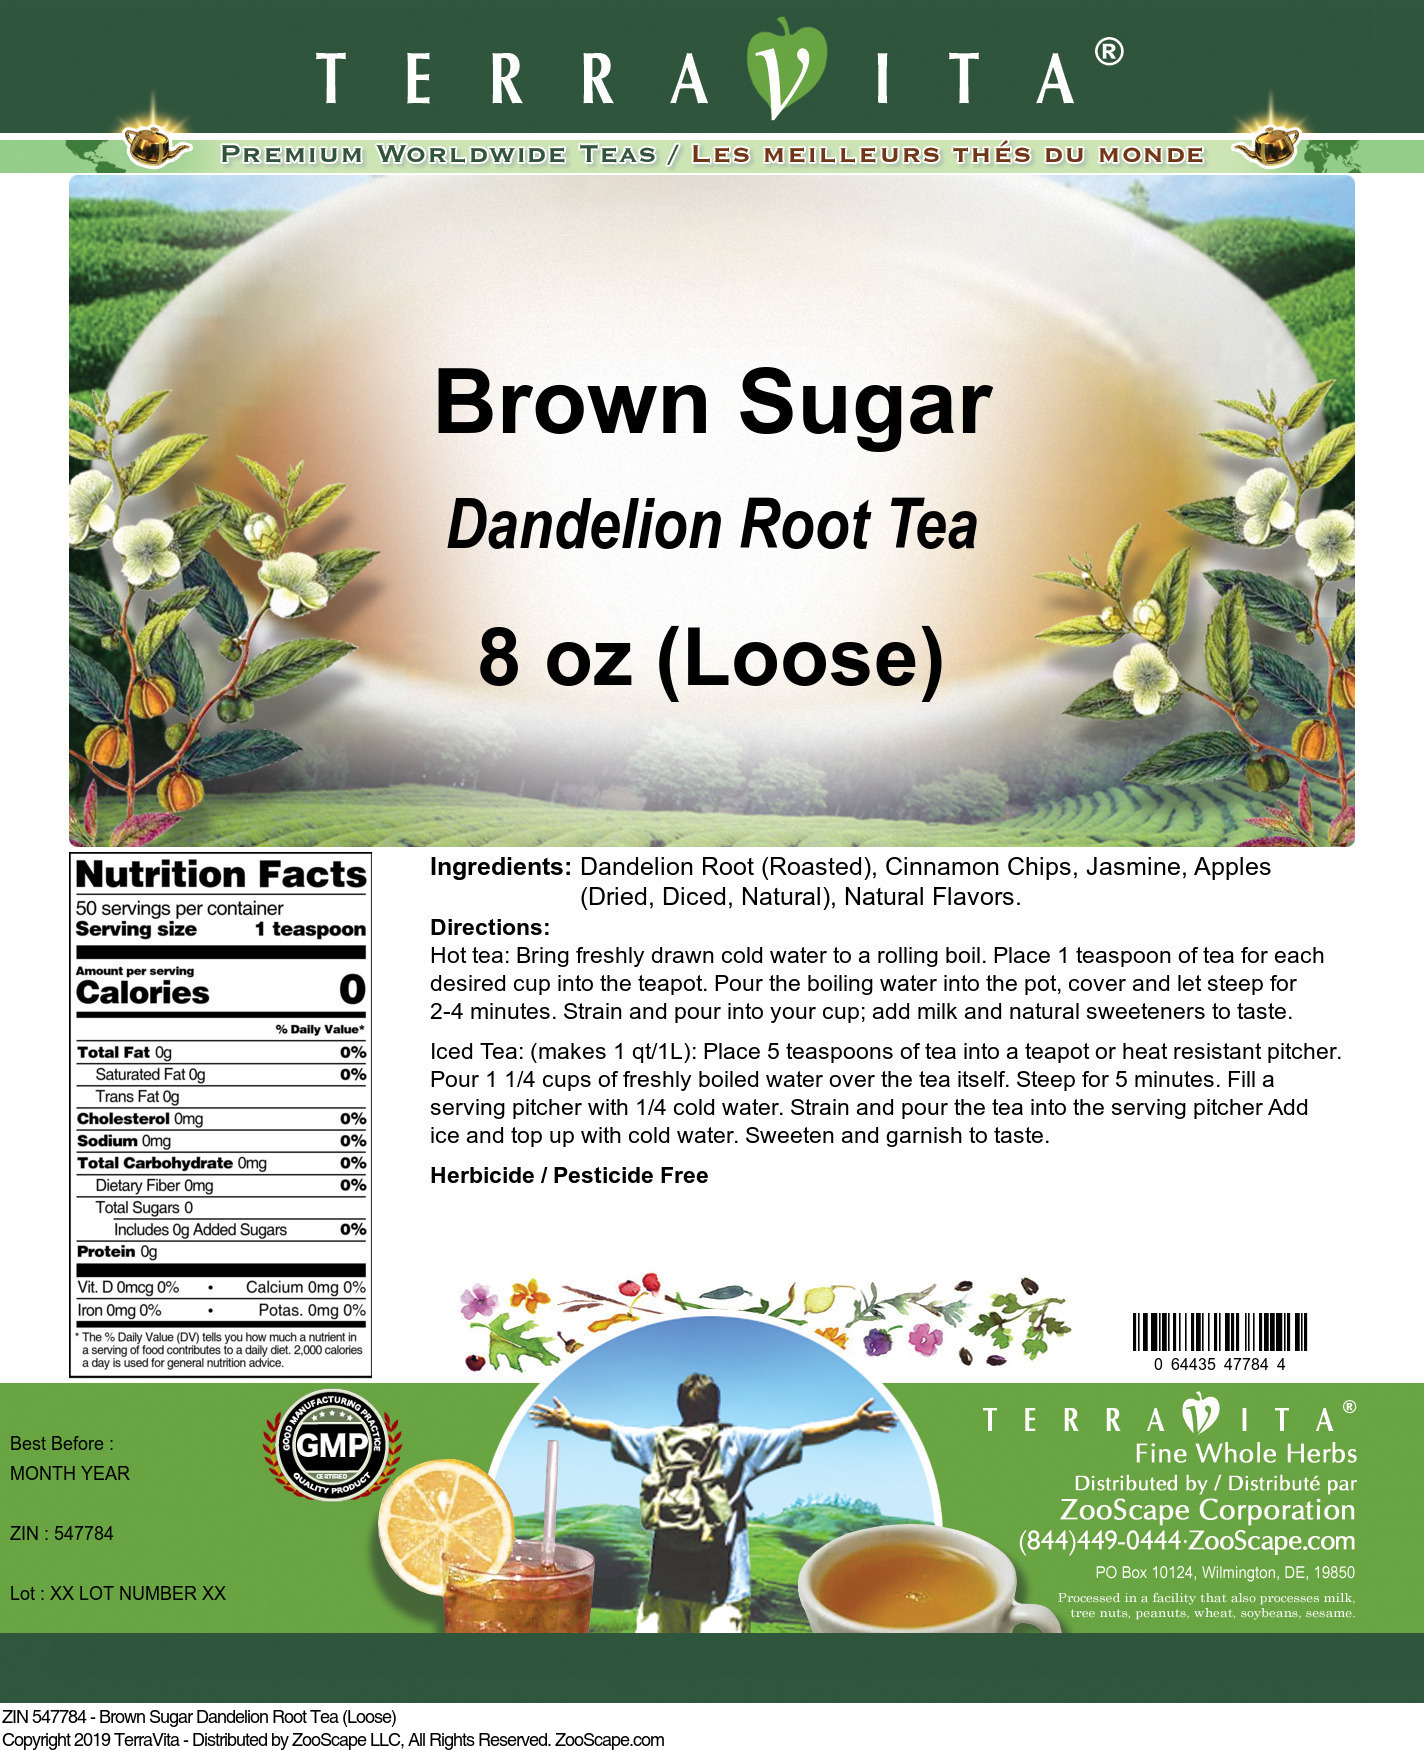 Brown Sugar Dandelion Root